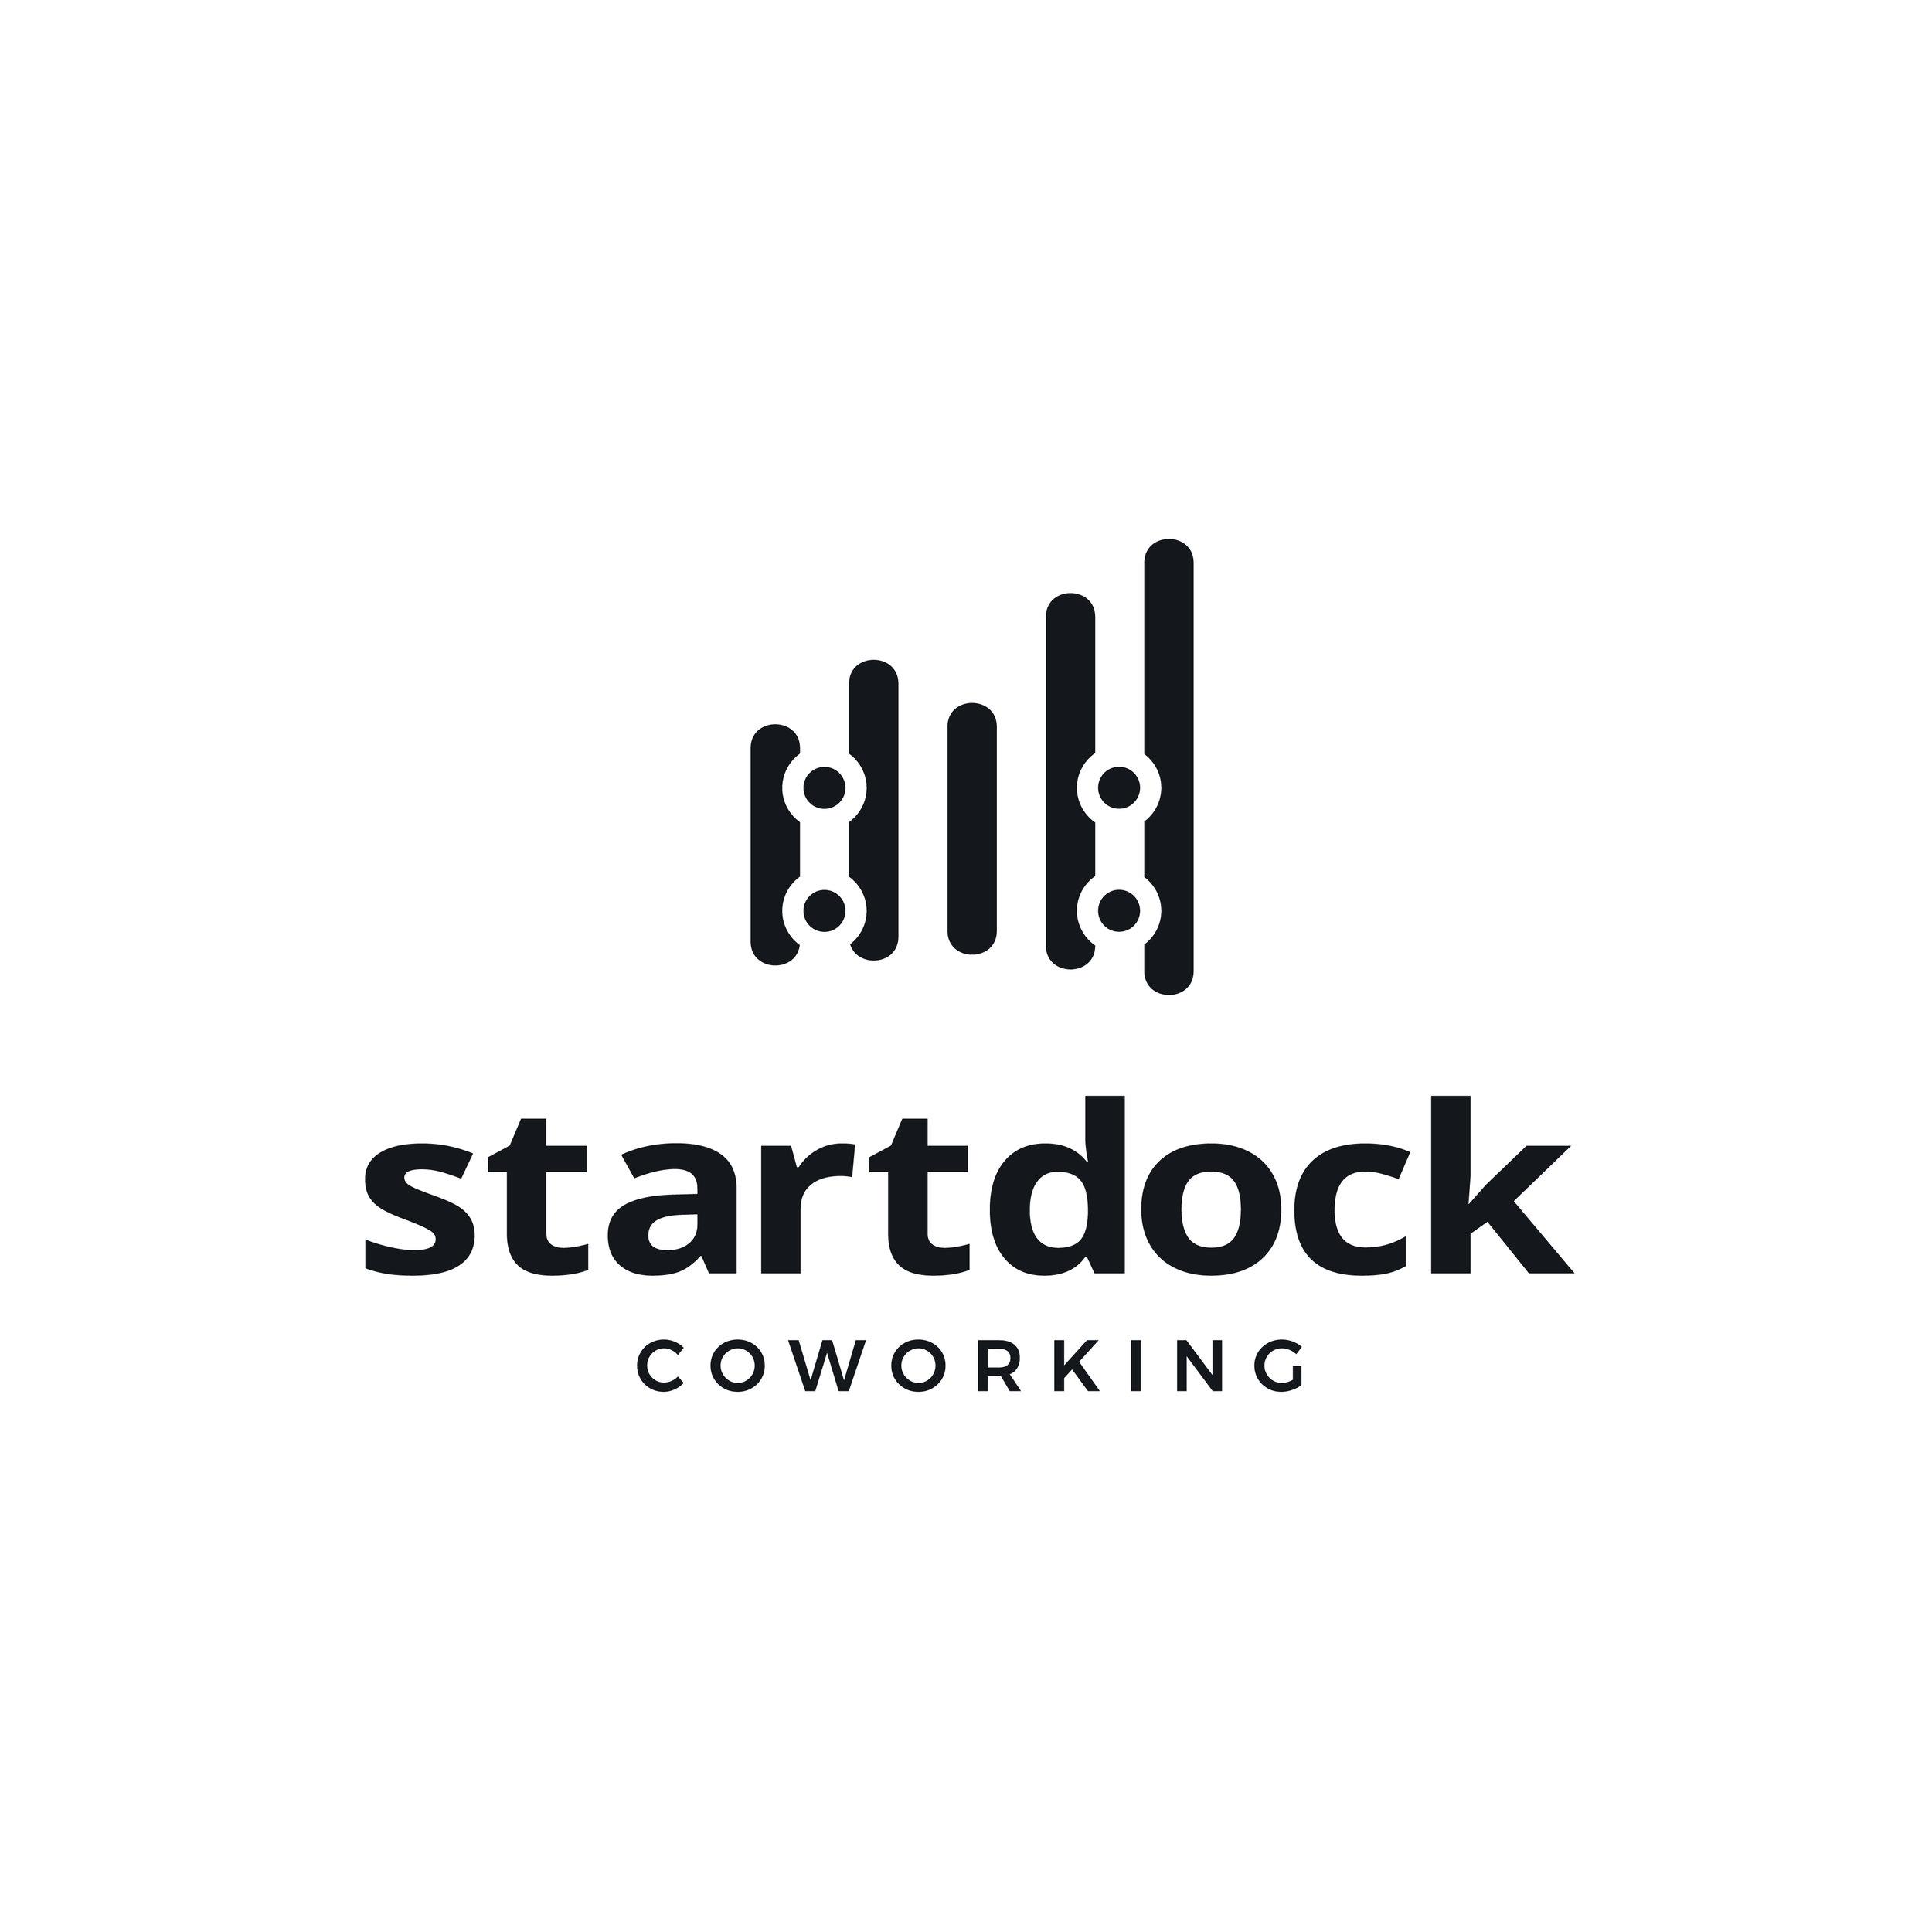 startdock_logo_black-01.jpg